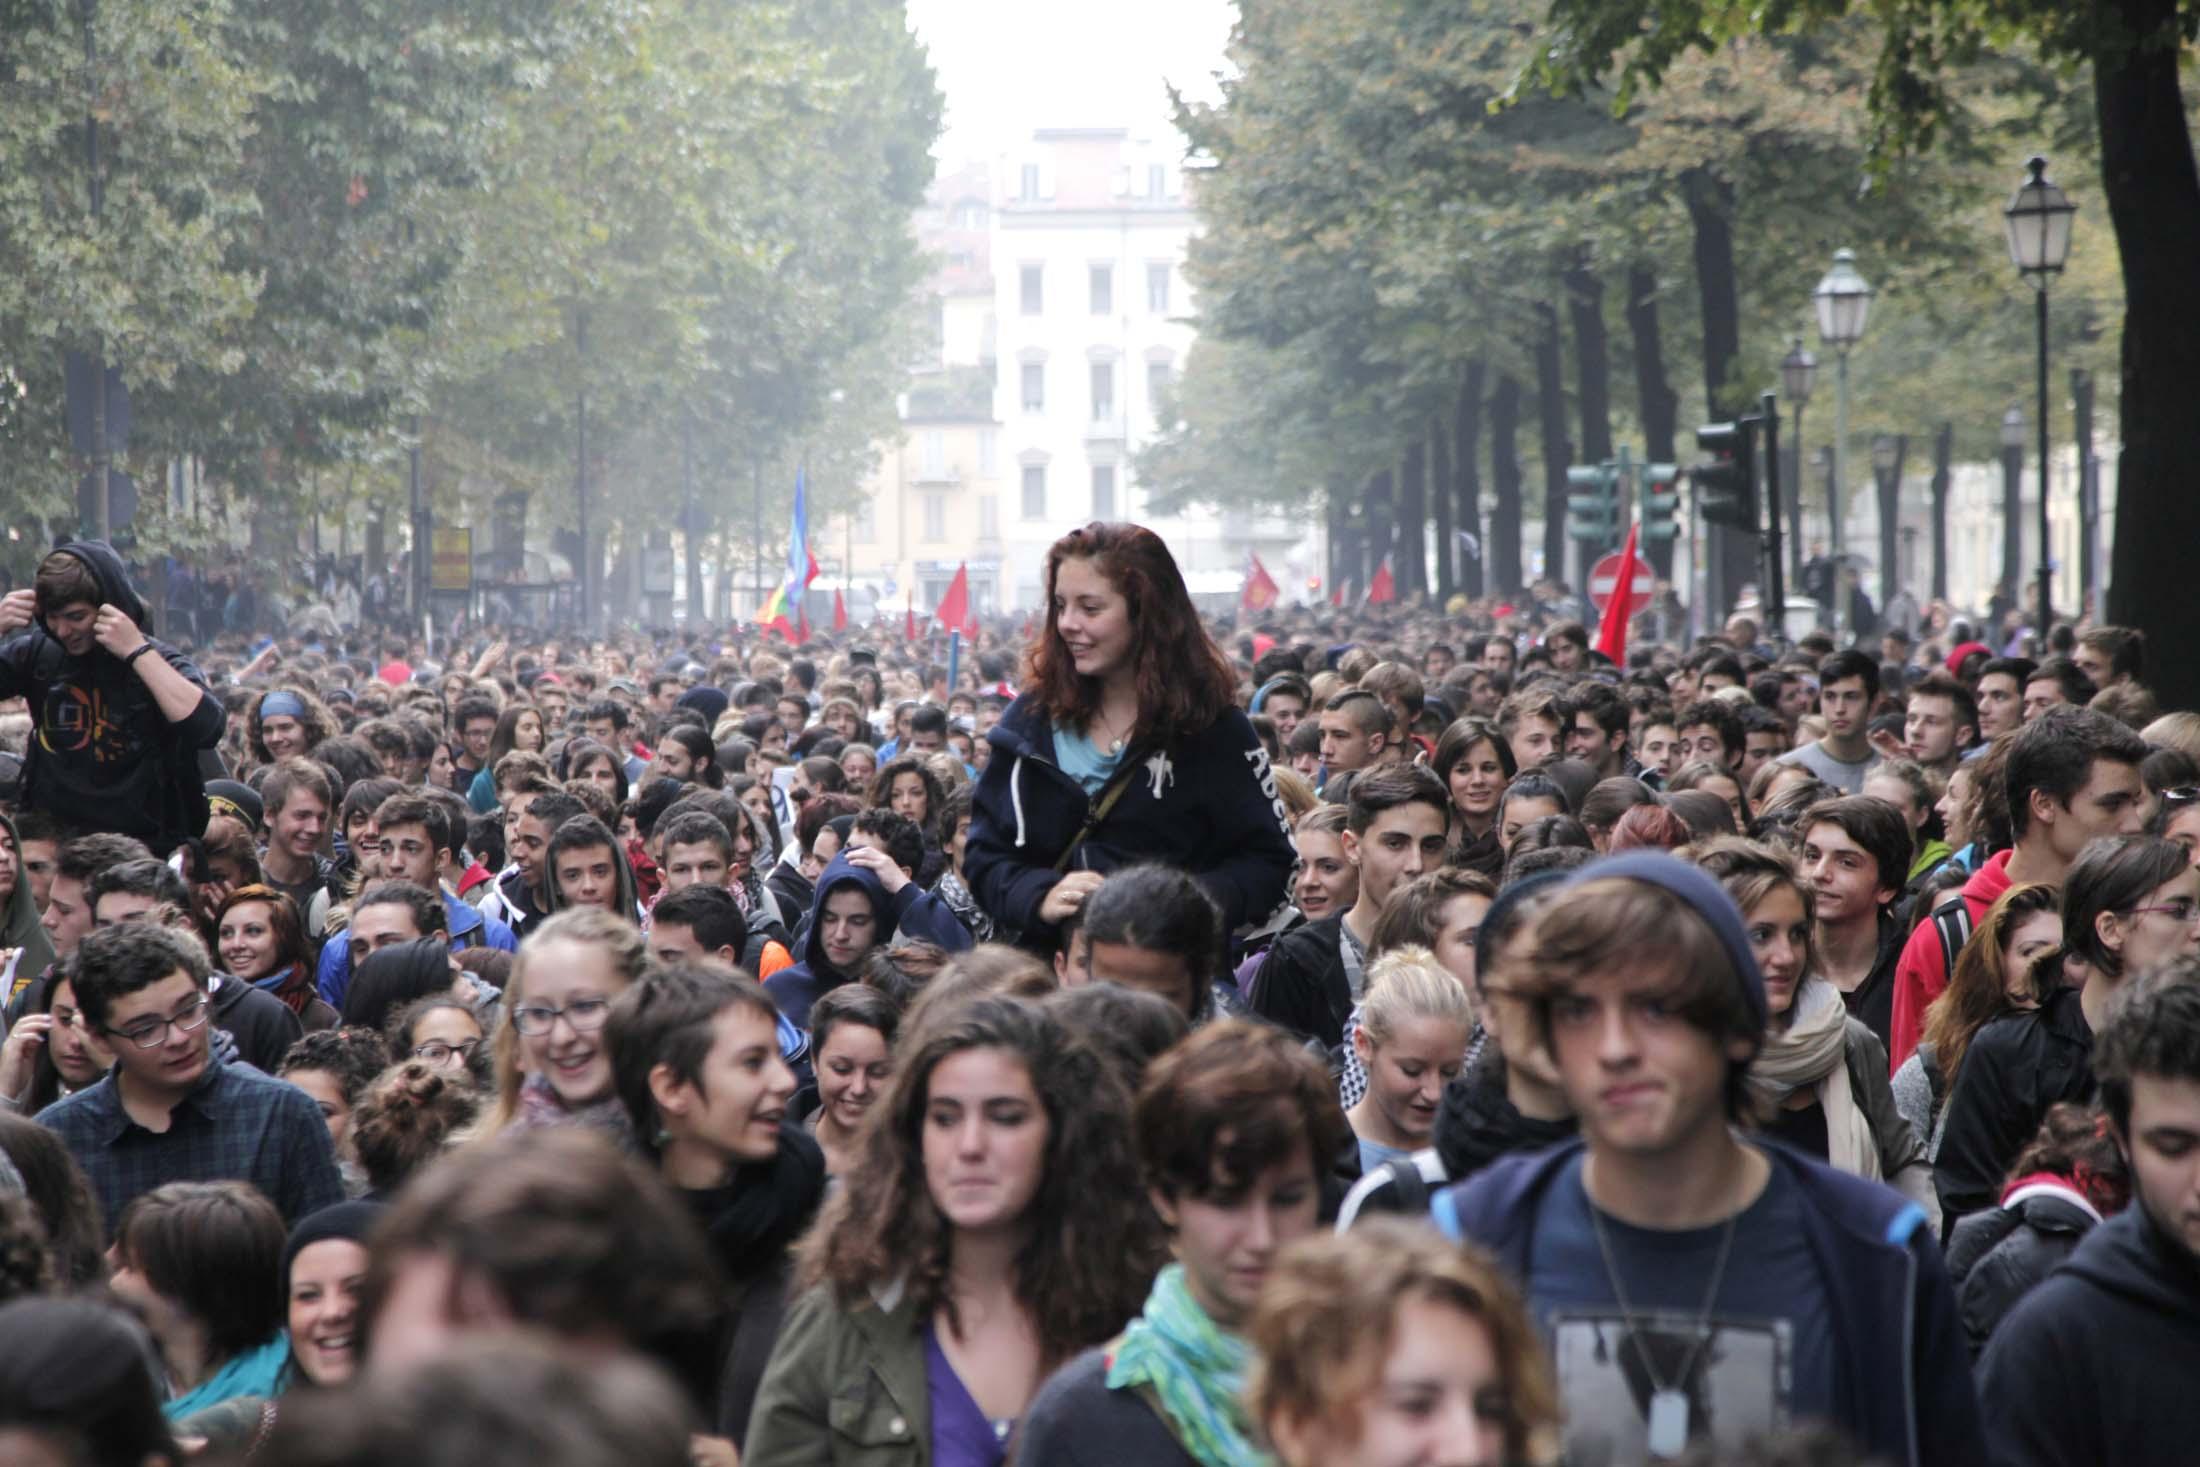 12/10/2012 manifestazione studenti to / andreja retsek